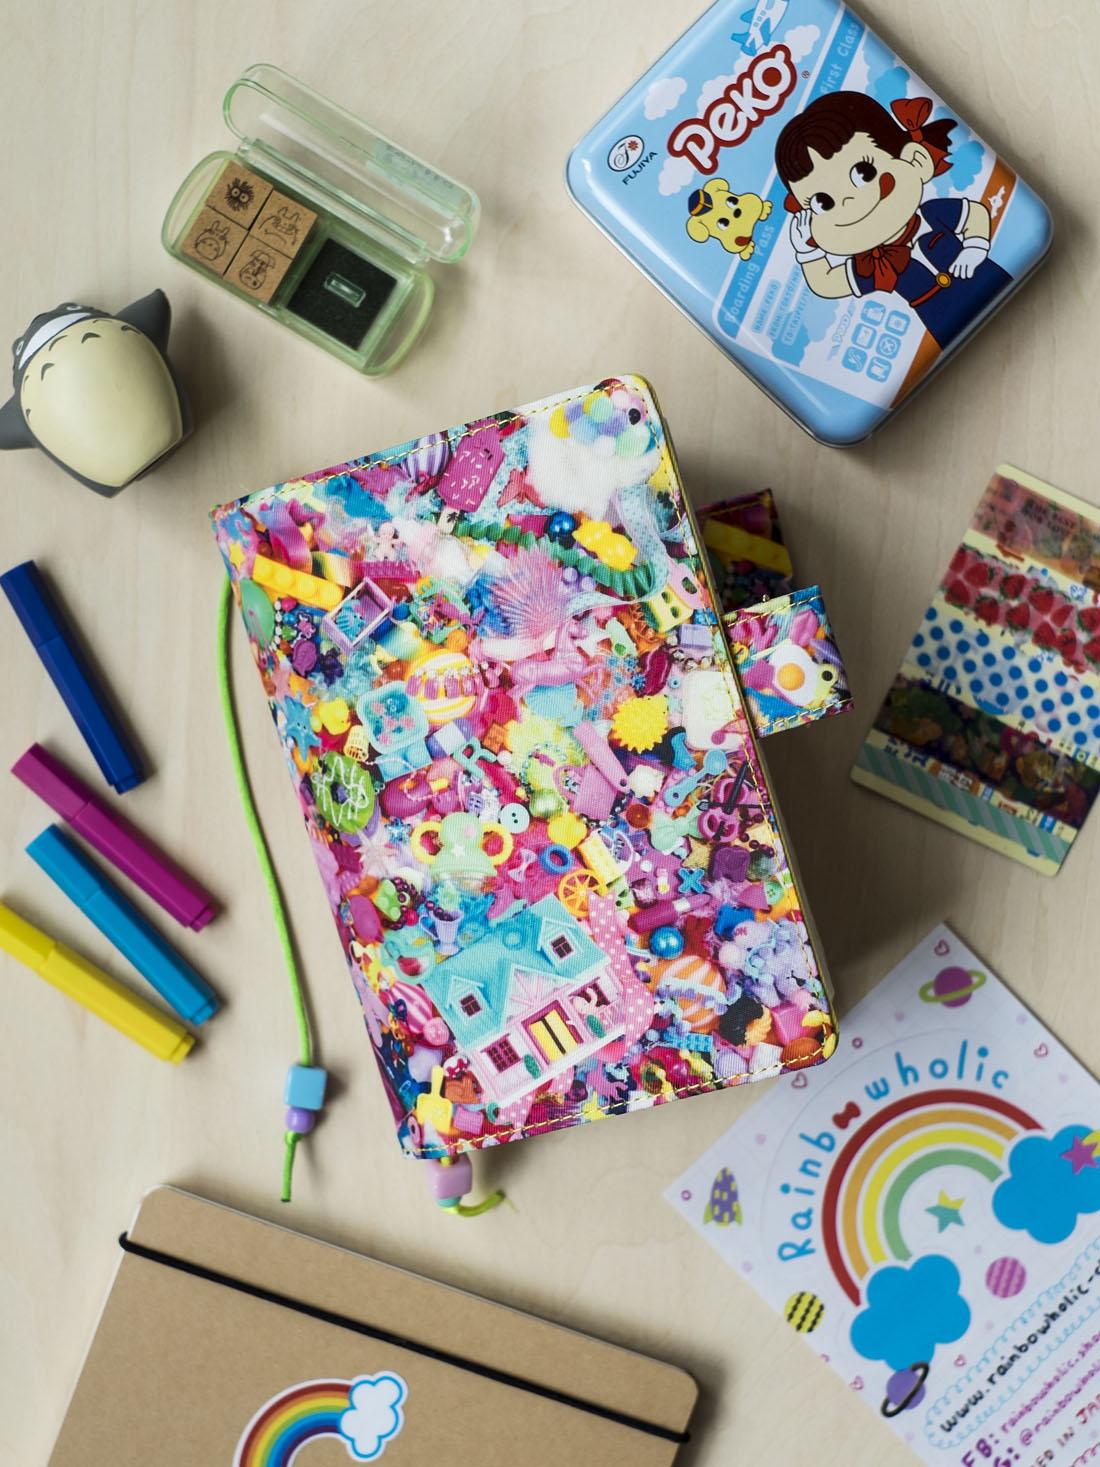 kawaii-journaling-kaila-ocampo-rainbowholic-1